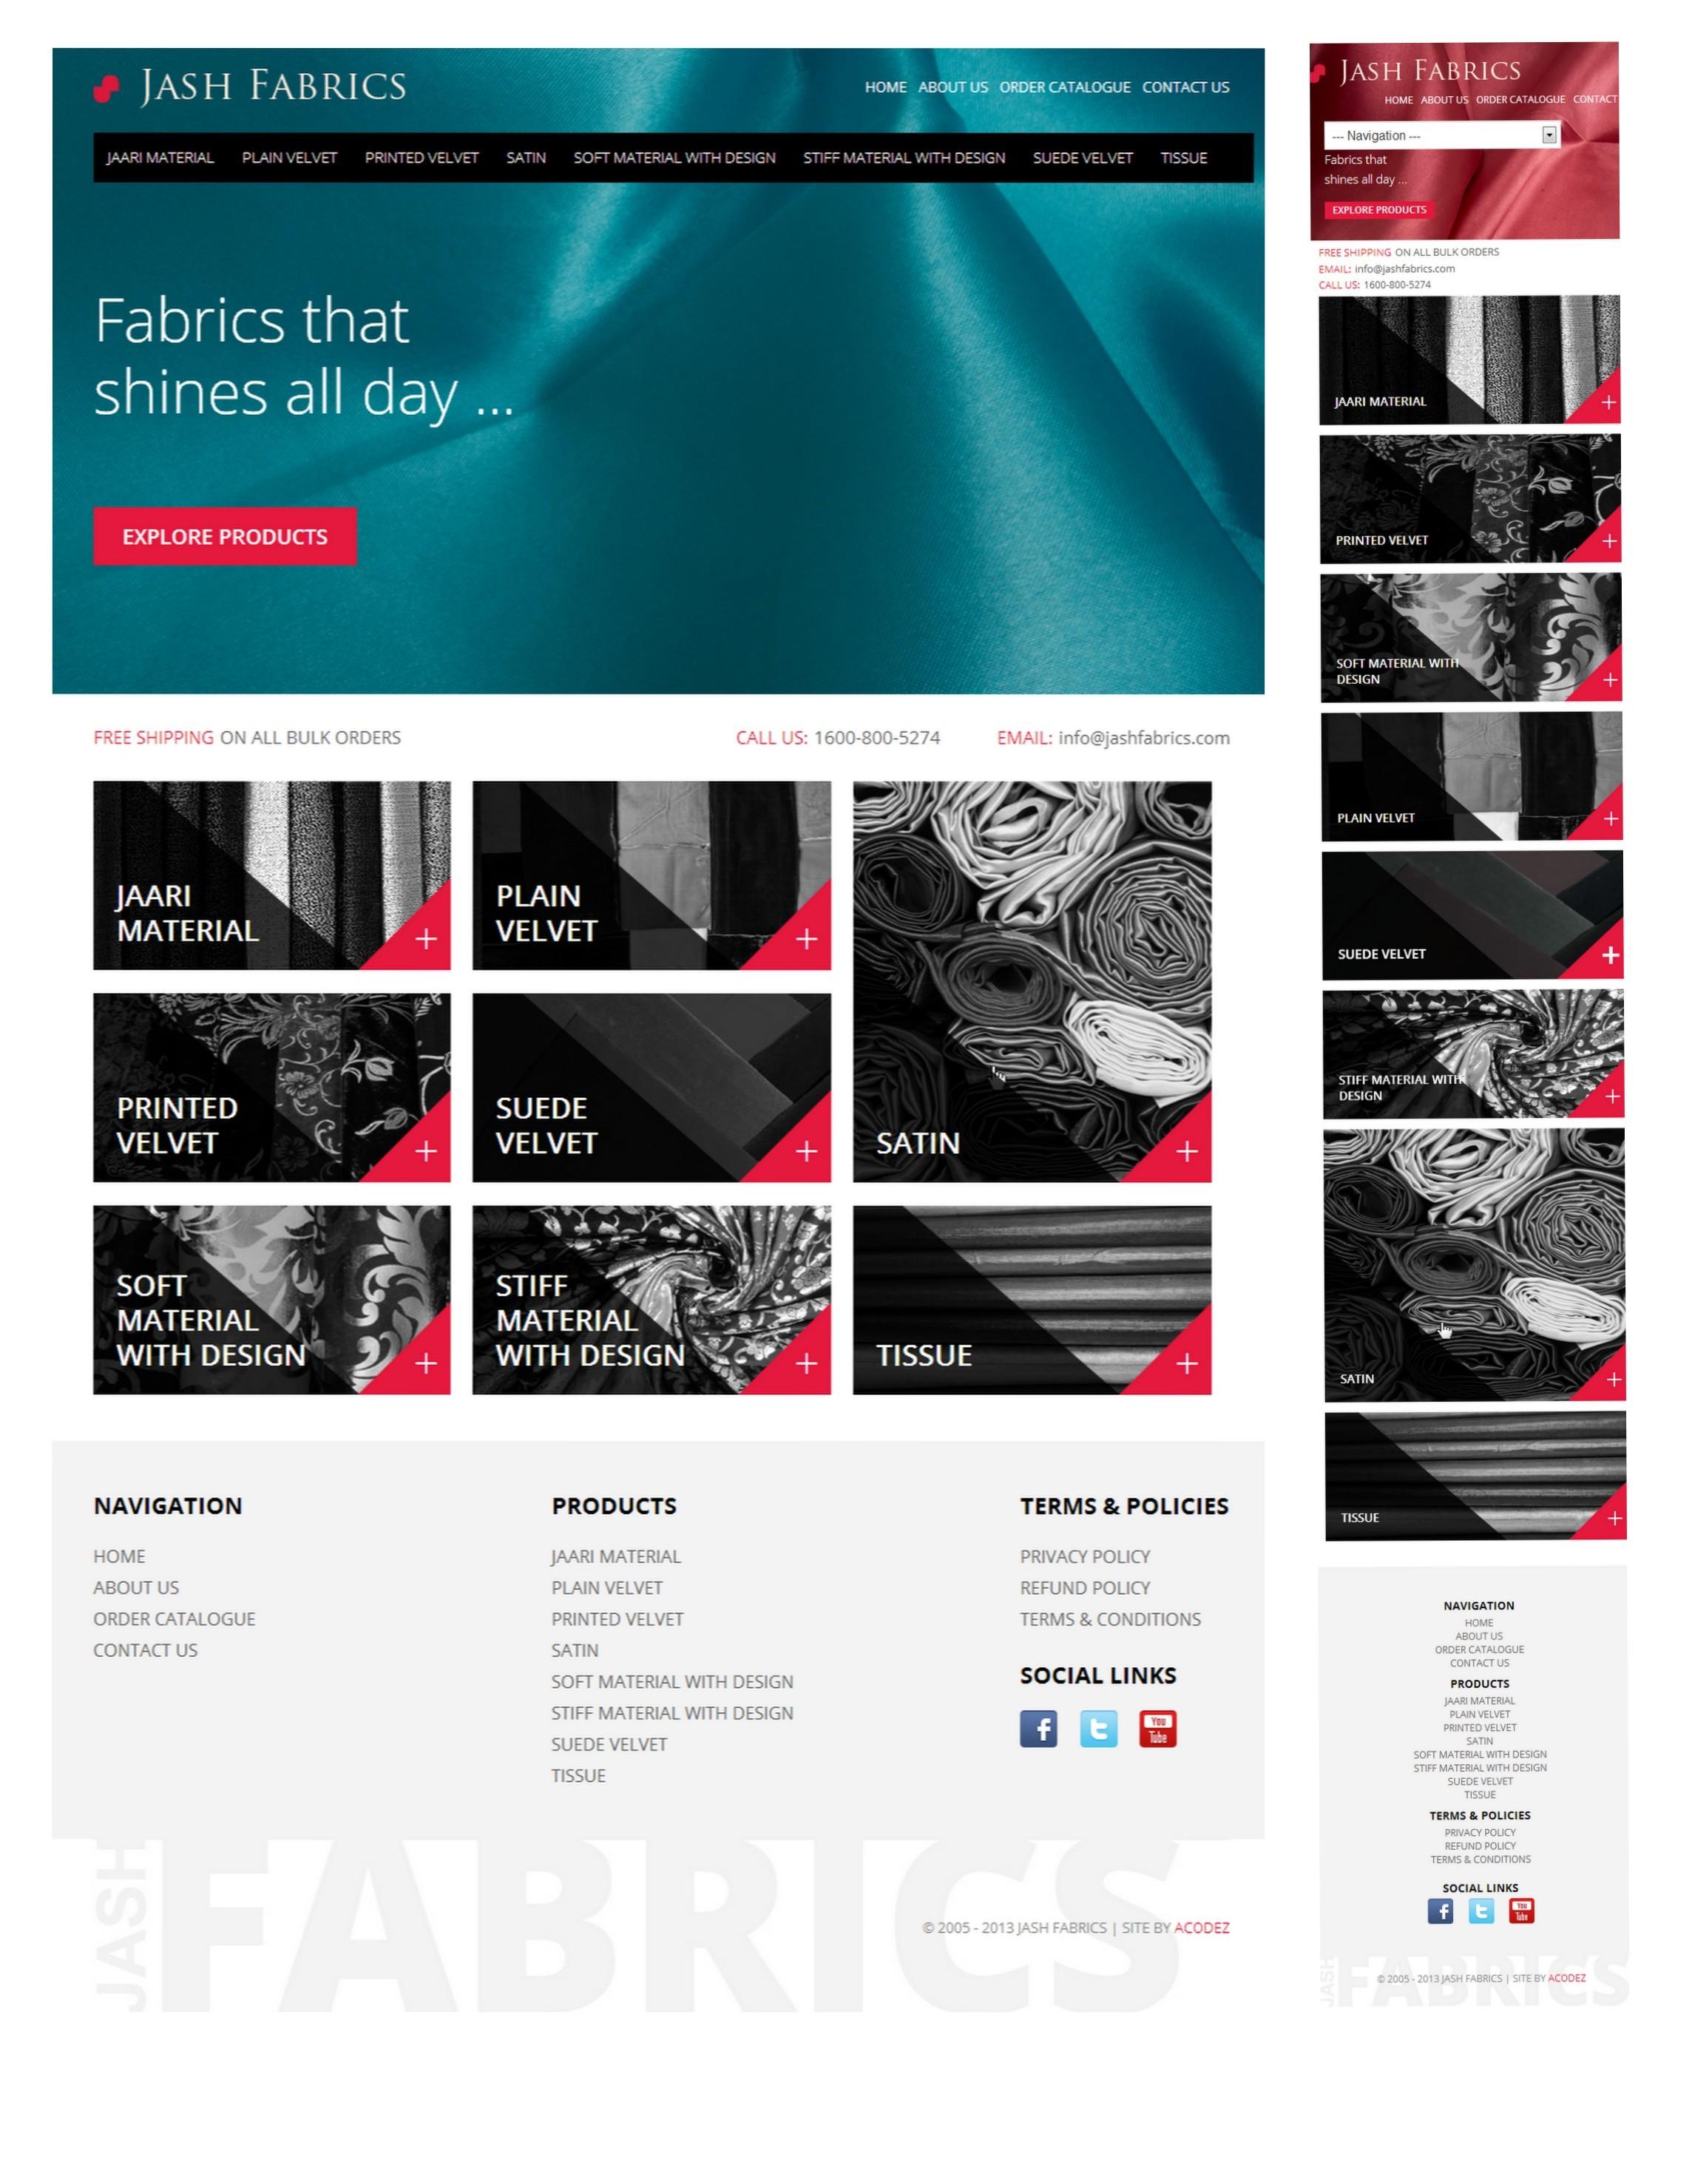 Web page designing services popular web design technologies - Website for home design ...